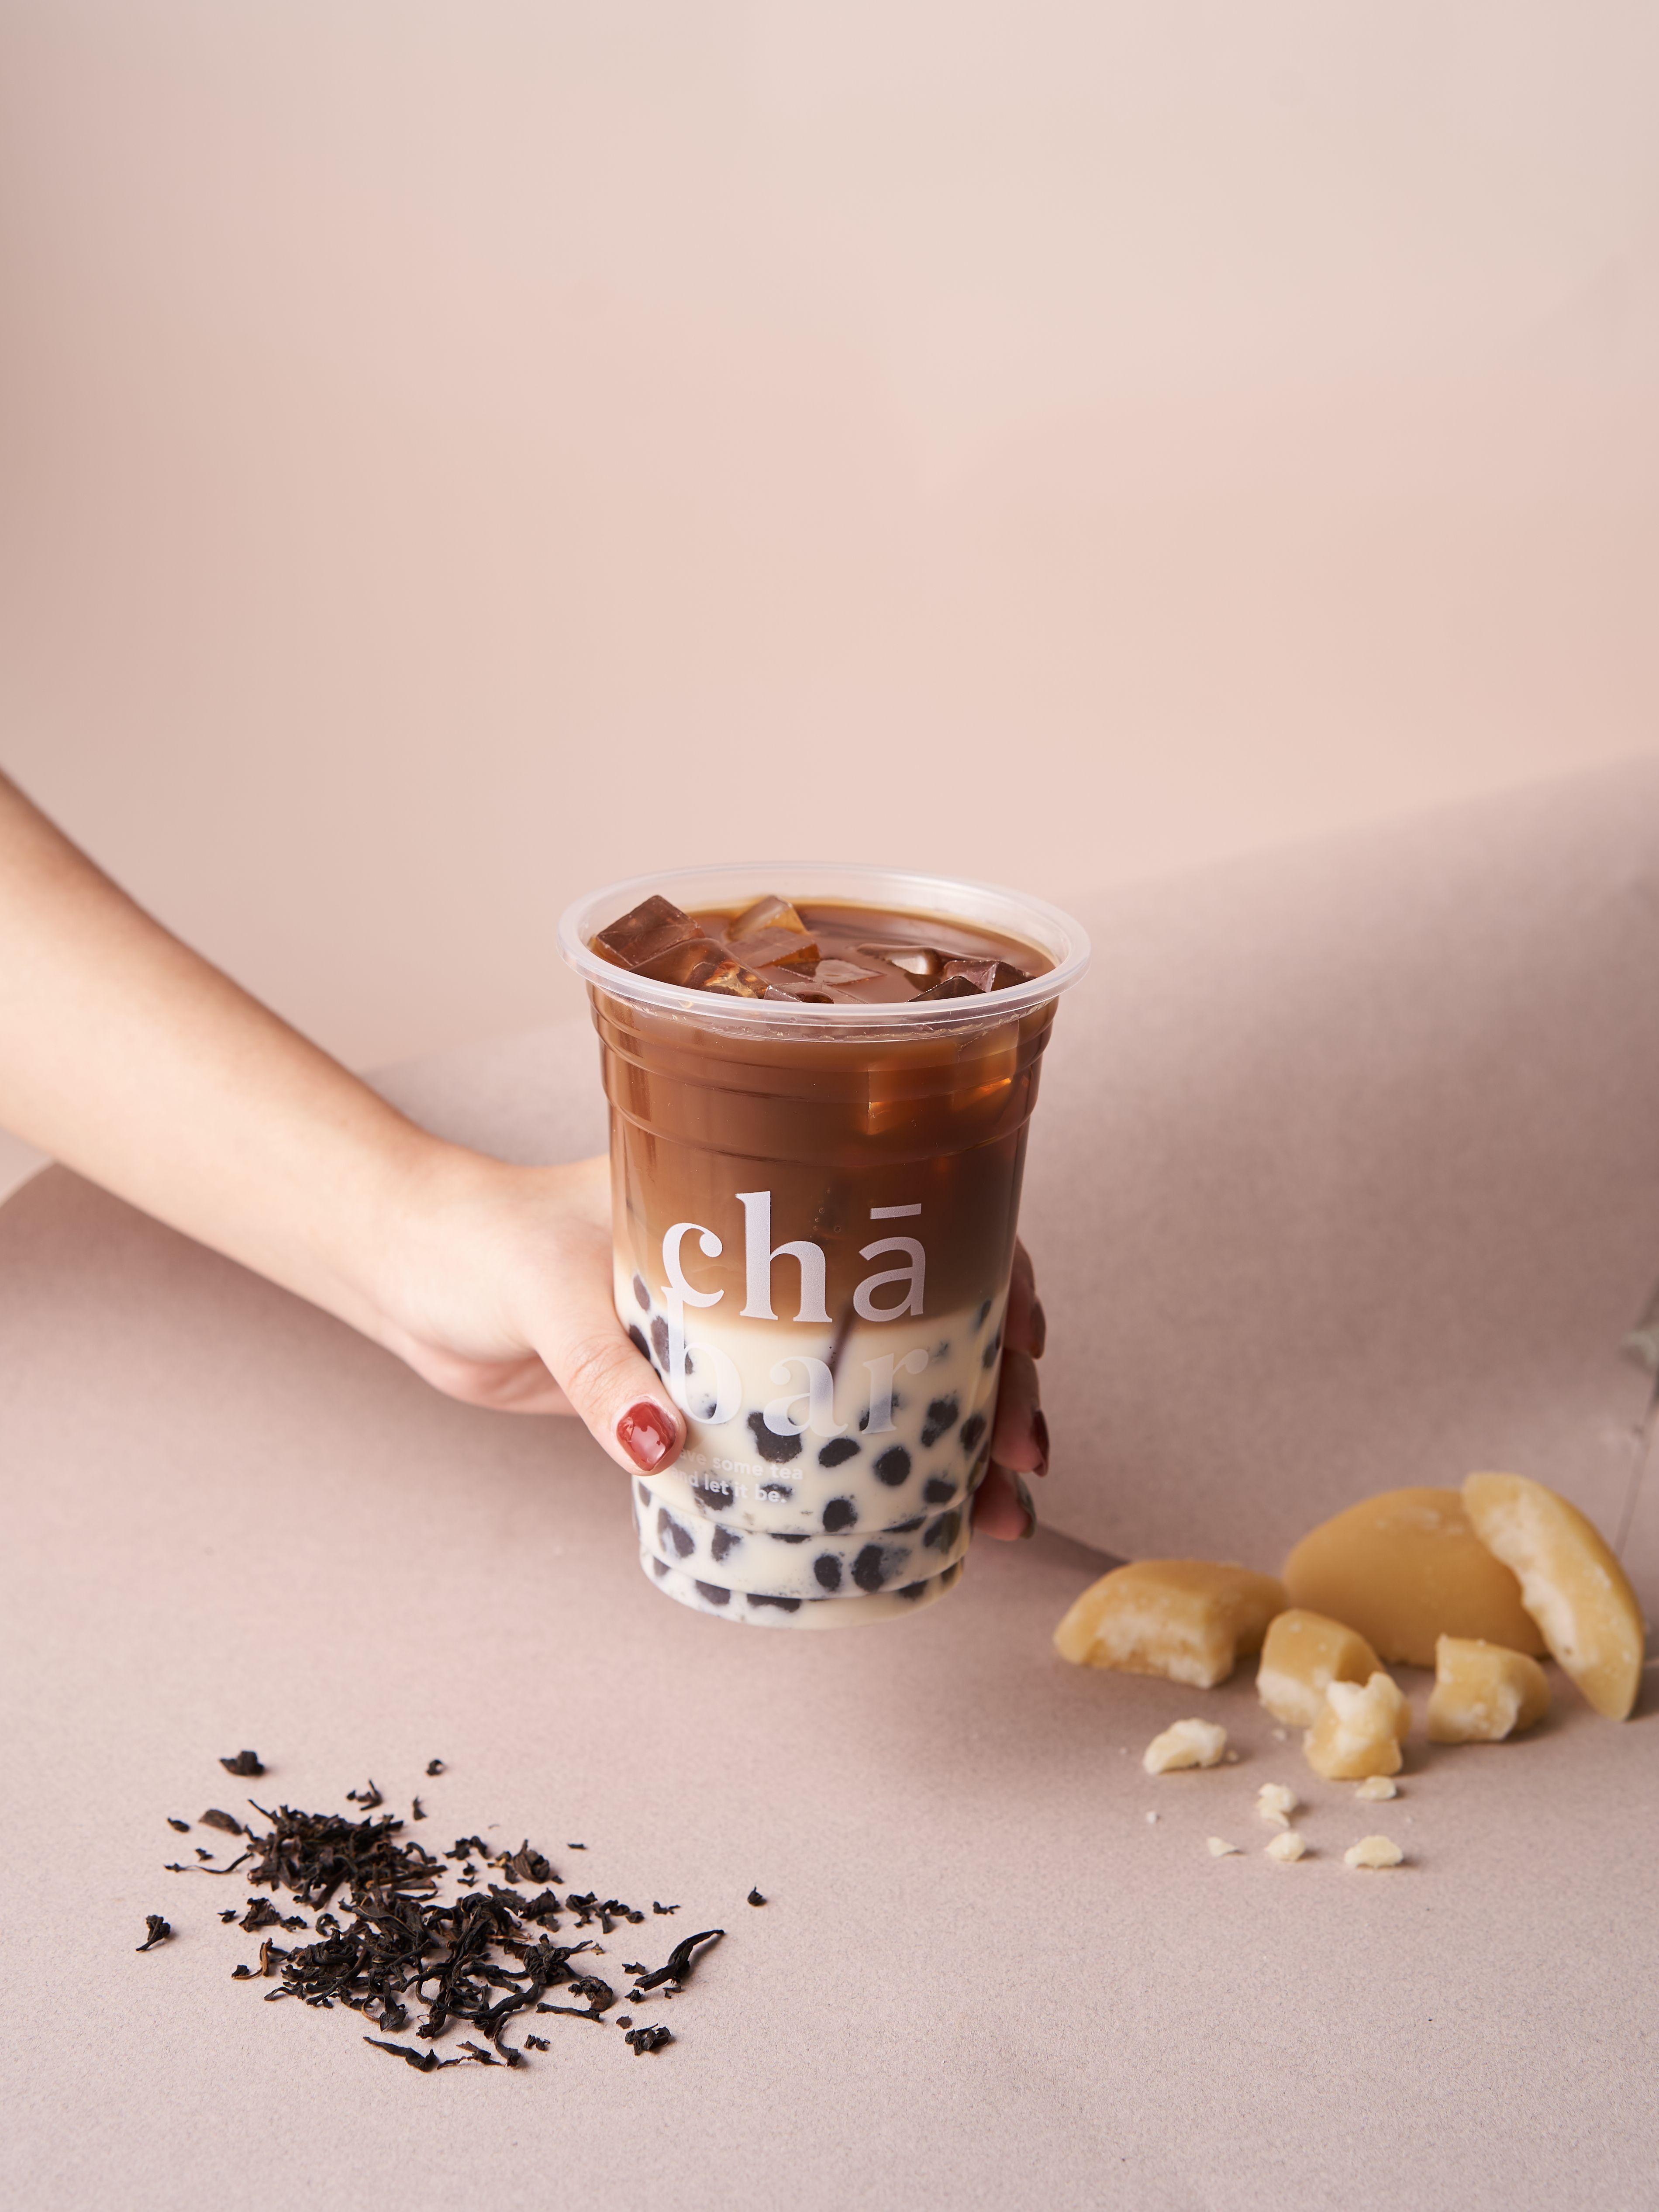 Cha bar bkk healthy tea bar in bangkok serving low